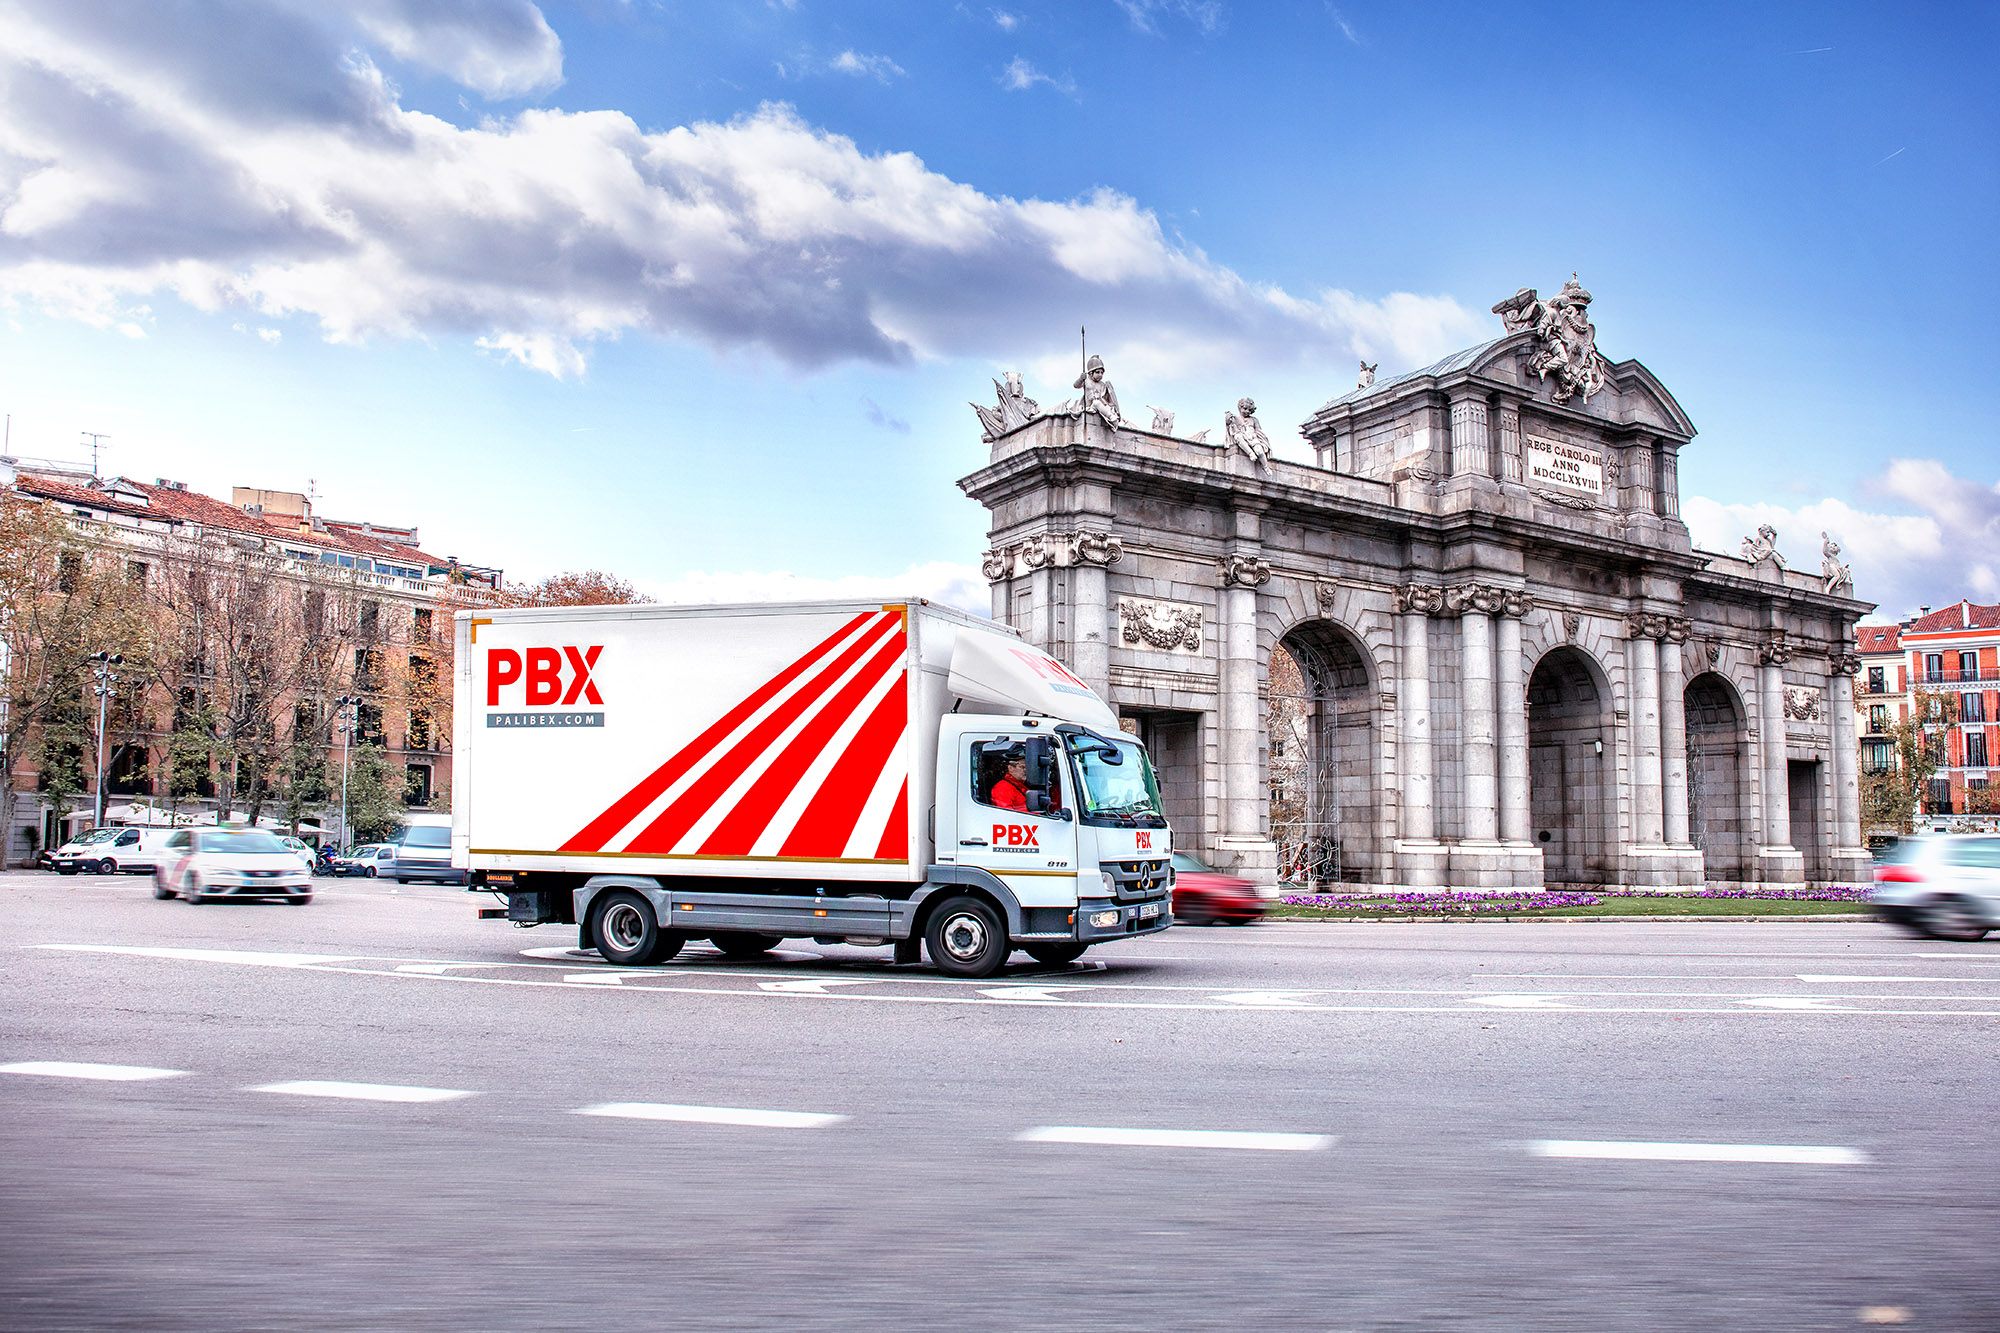 Palibex -PBX -Transporte urgente mercancia paletizada - Beusual -ROTULACION FLOTA PBX